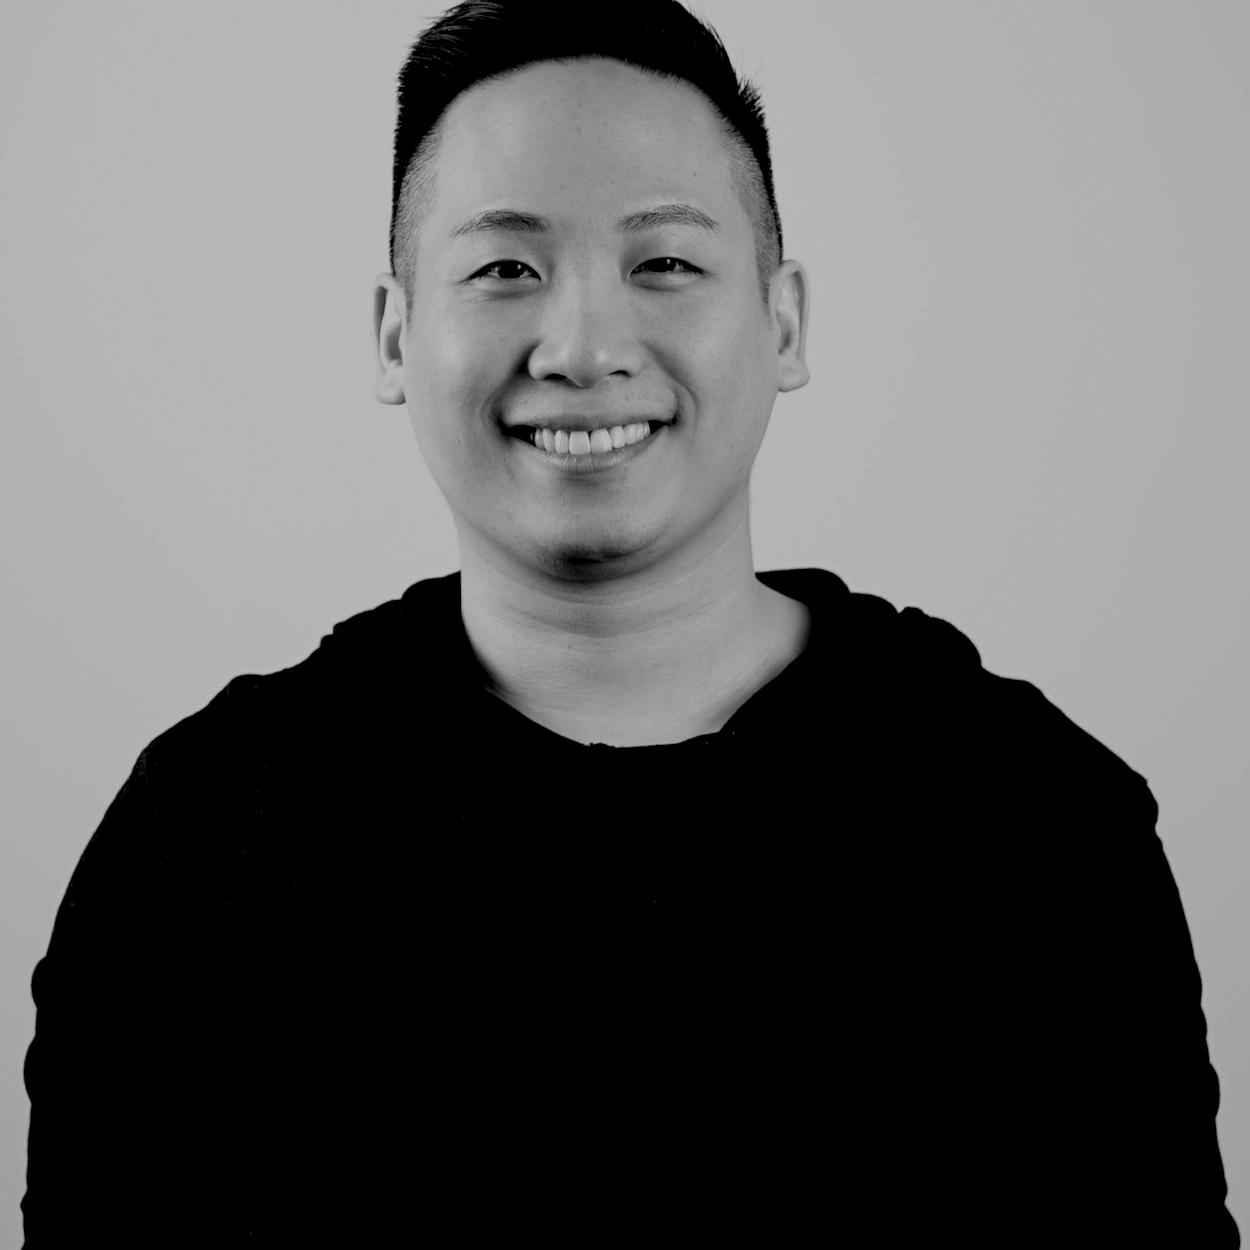 Chris Cheung